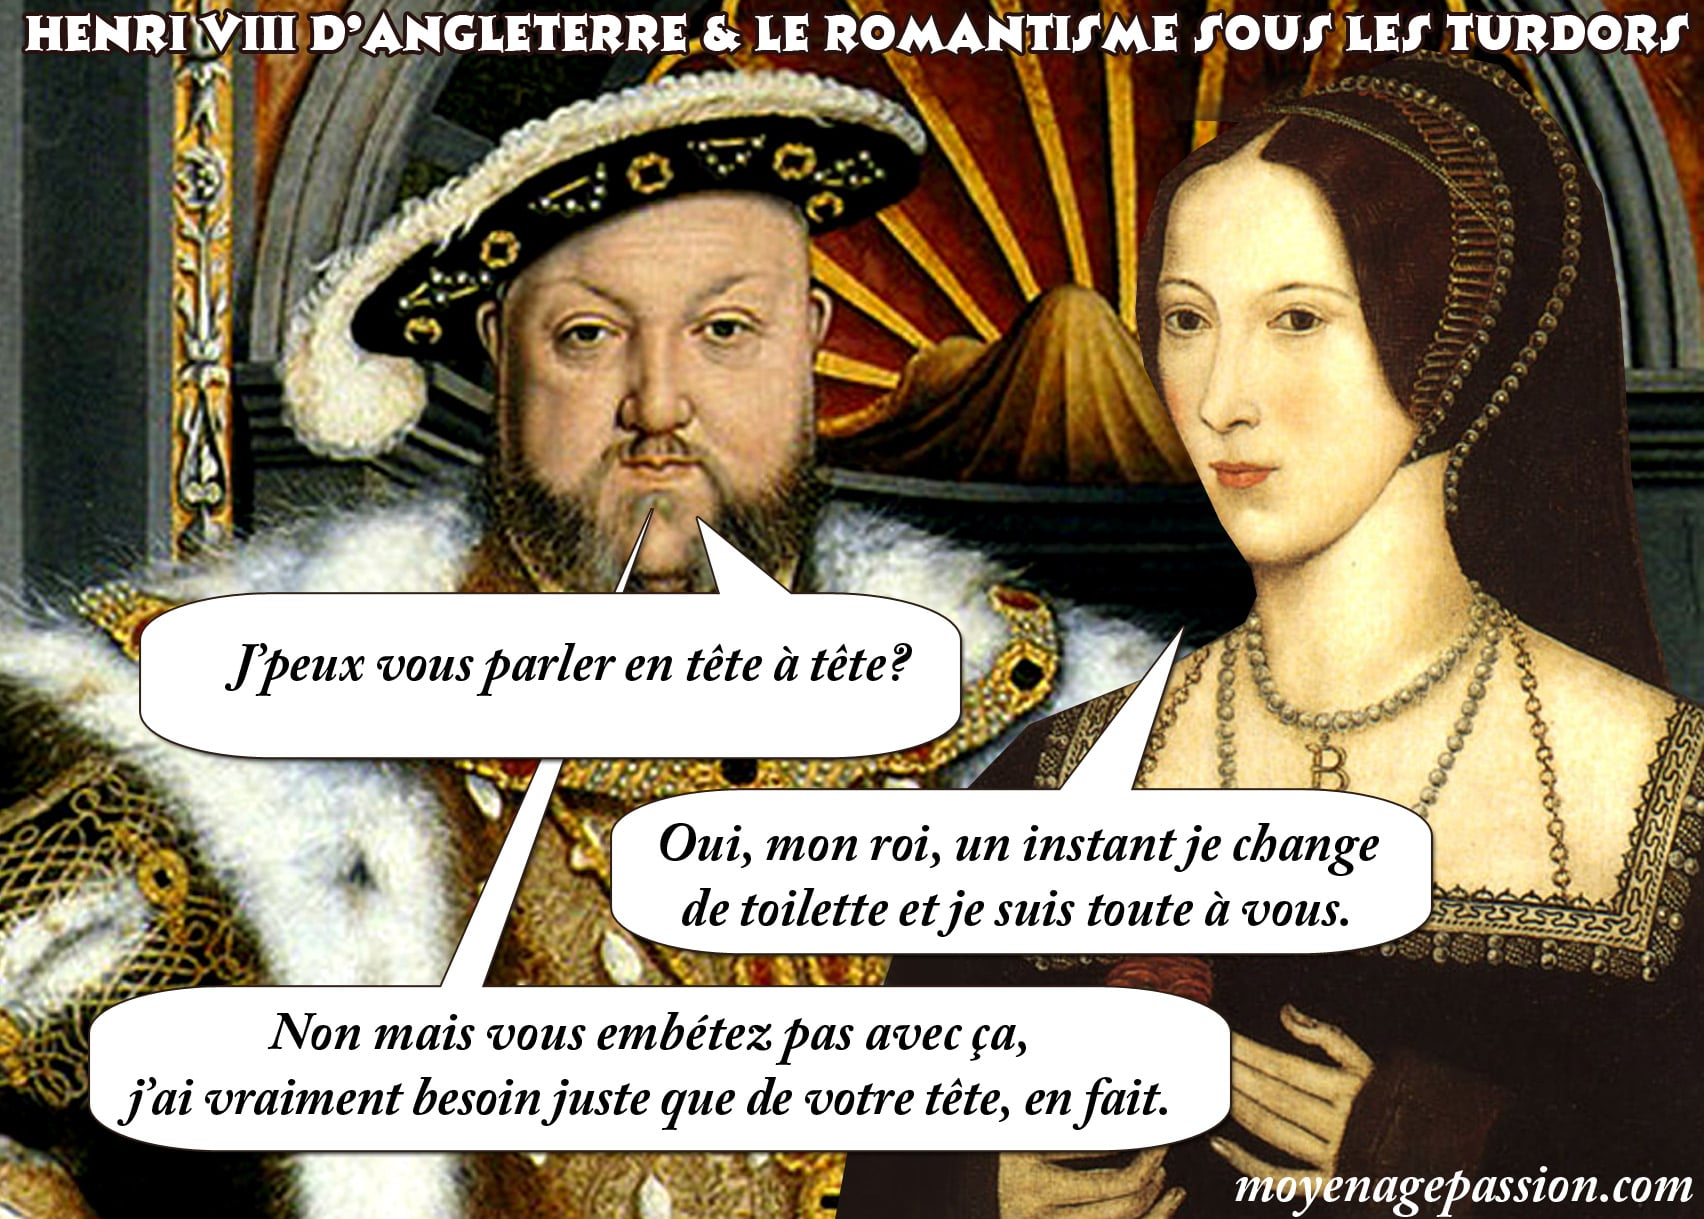 humour_medieval_joke_blague_histoire_henri_VIII_barbe_bleue_tudor_anne_boleyn_renaissance